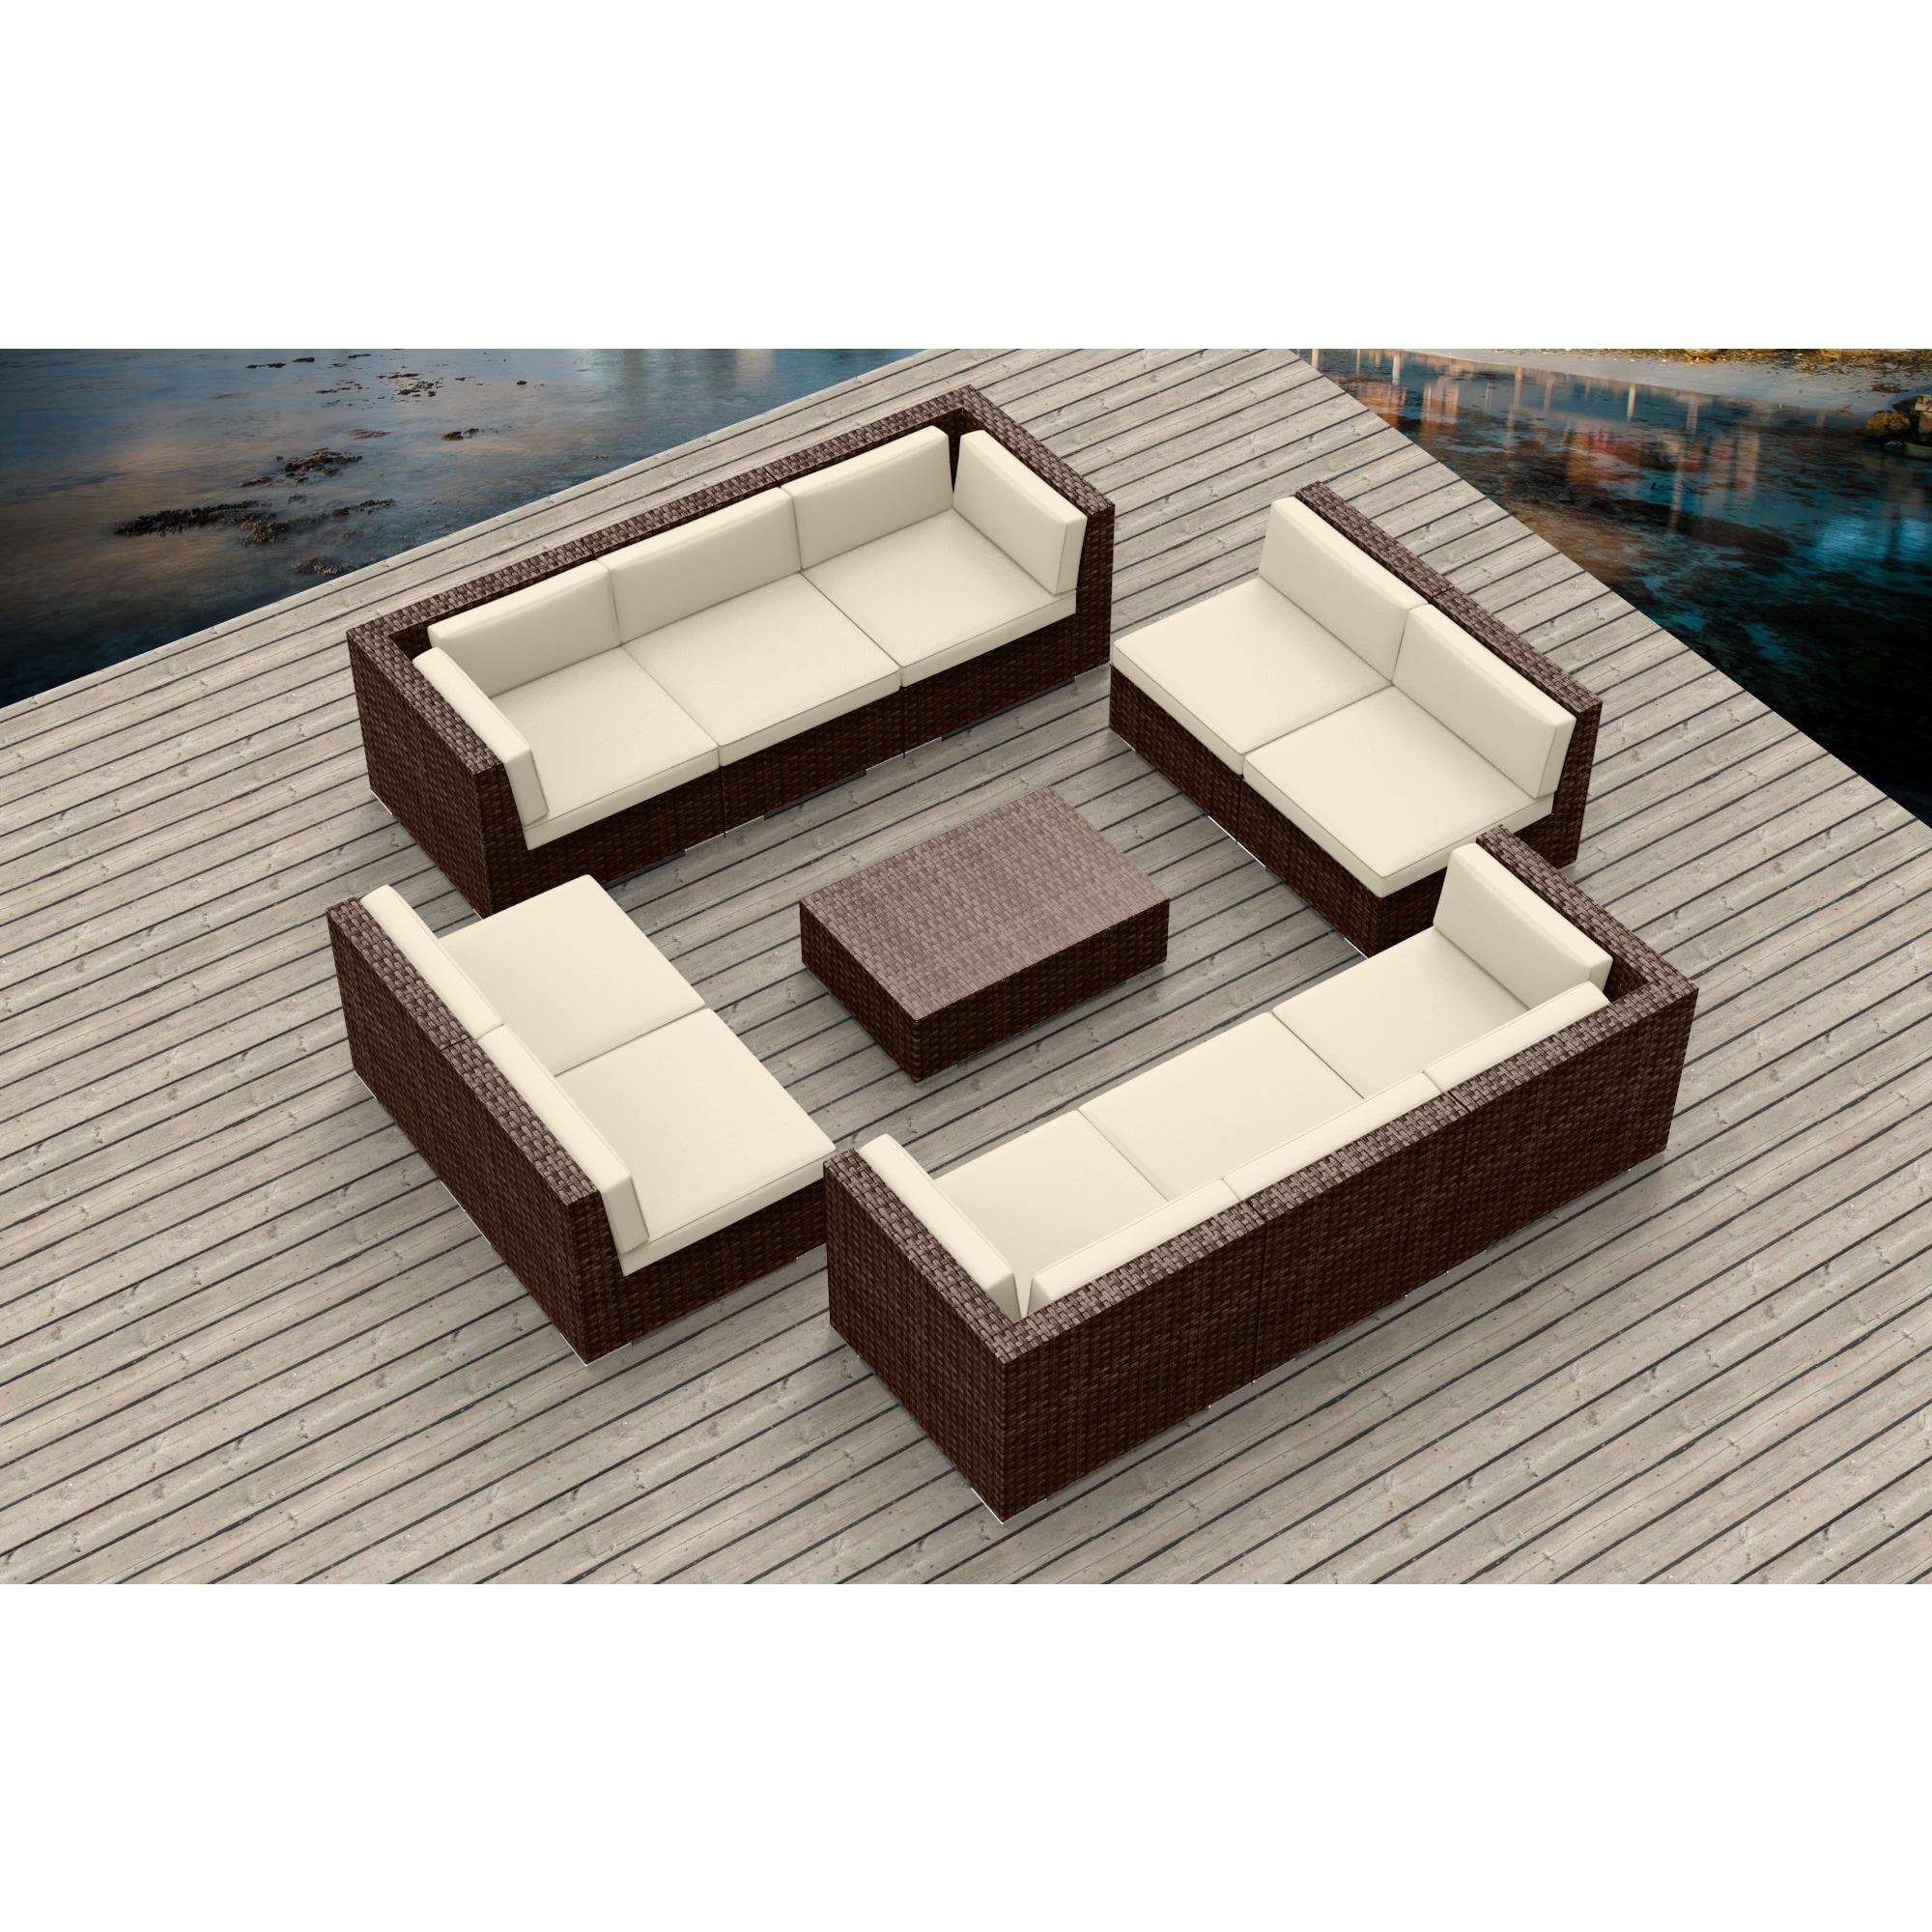 Urban Furnishing Brown Series 11a Modern Outdoor Backyard Wicker Rattan Patio Furniture Sofa Sectional Couch Set